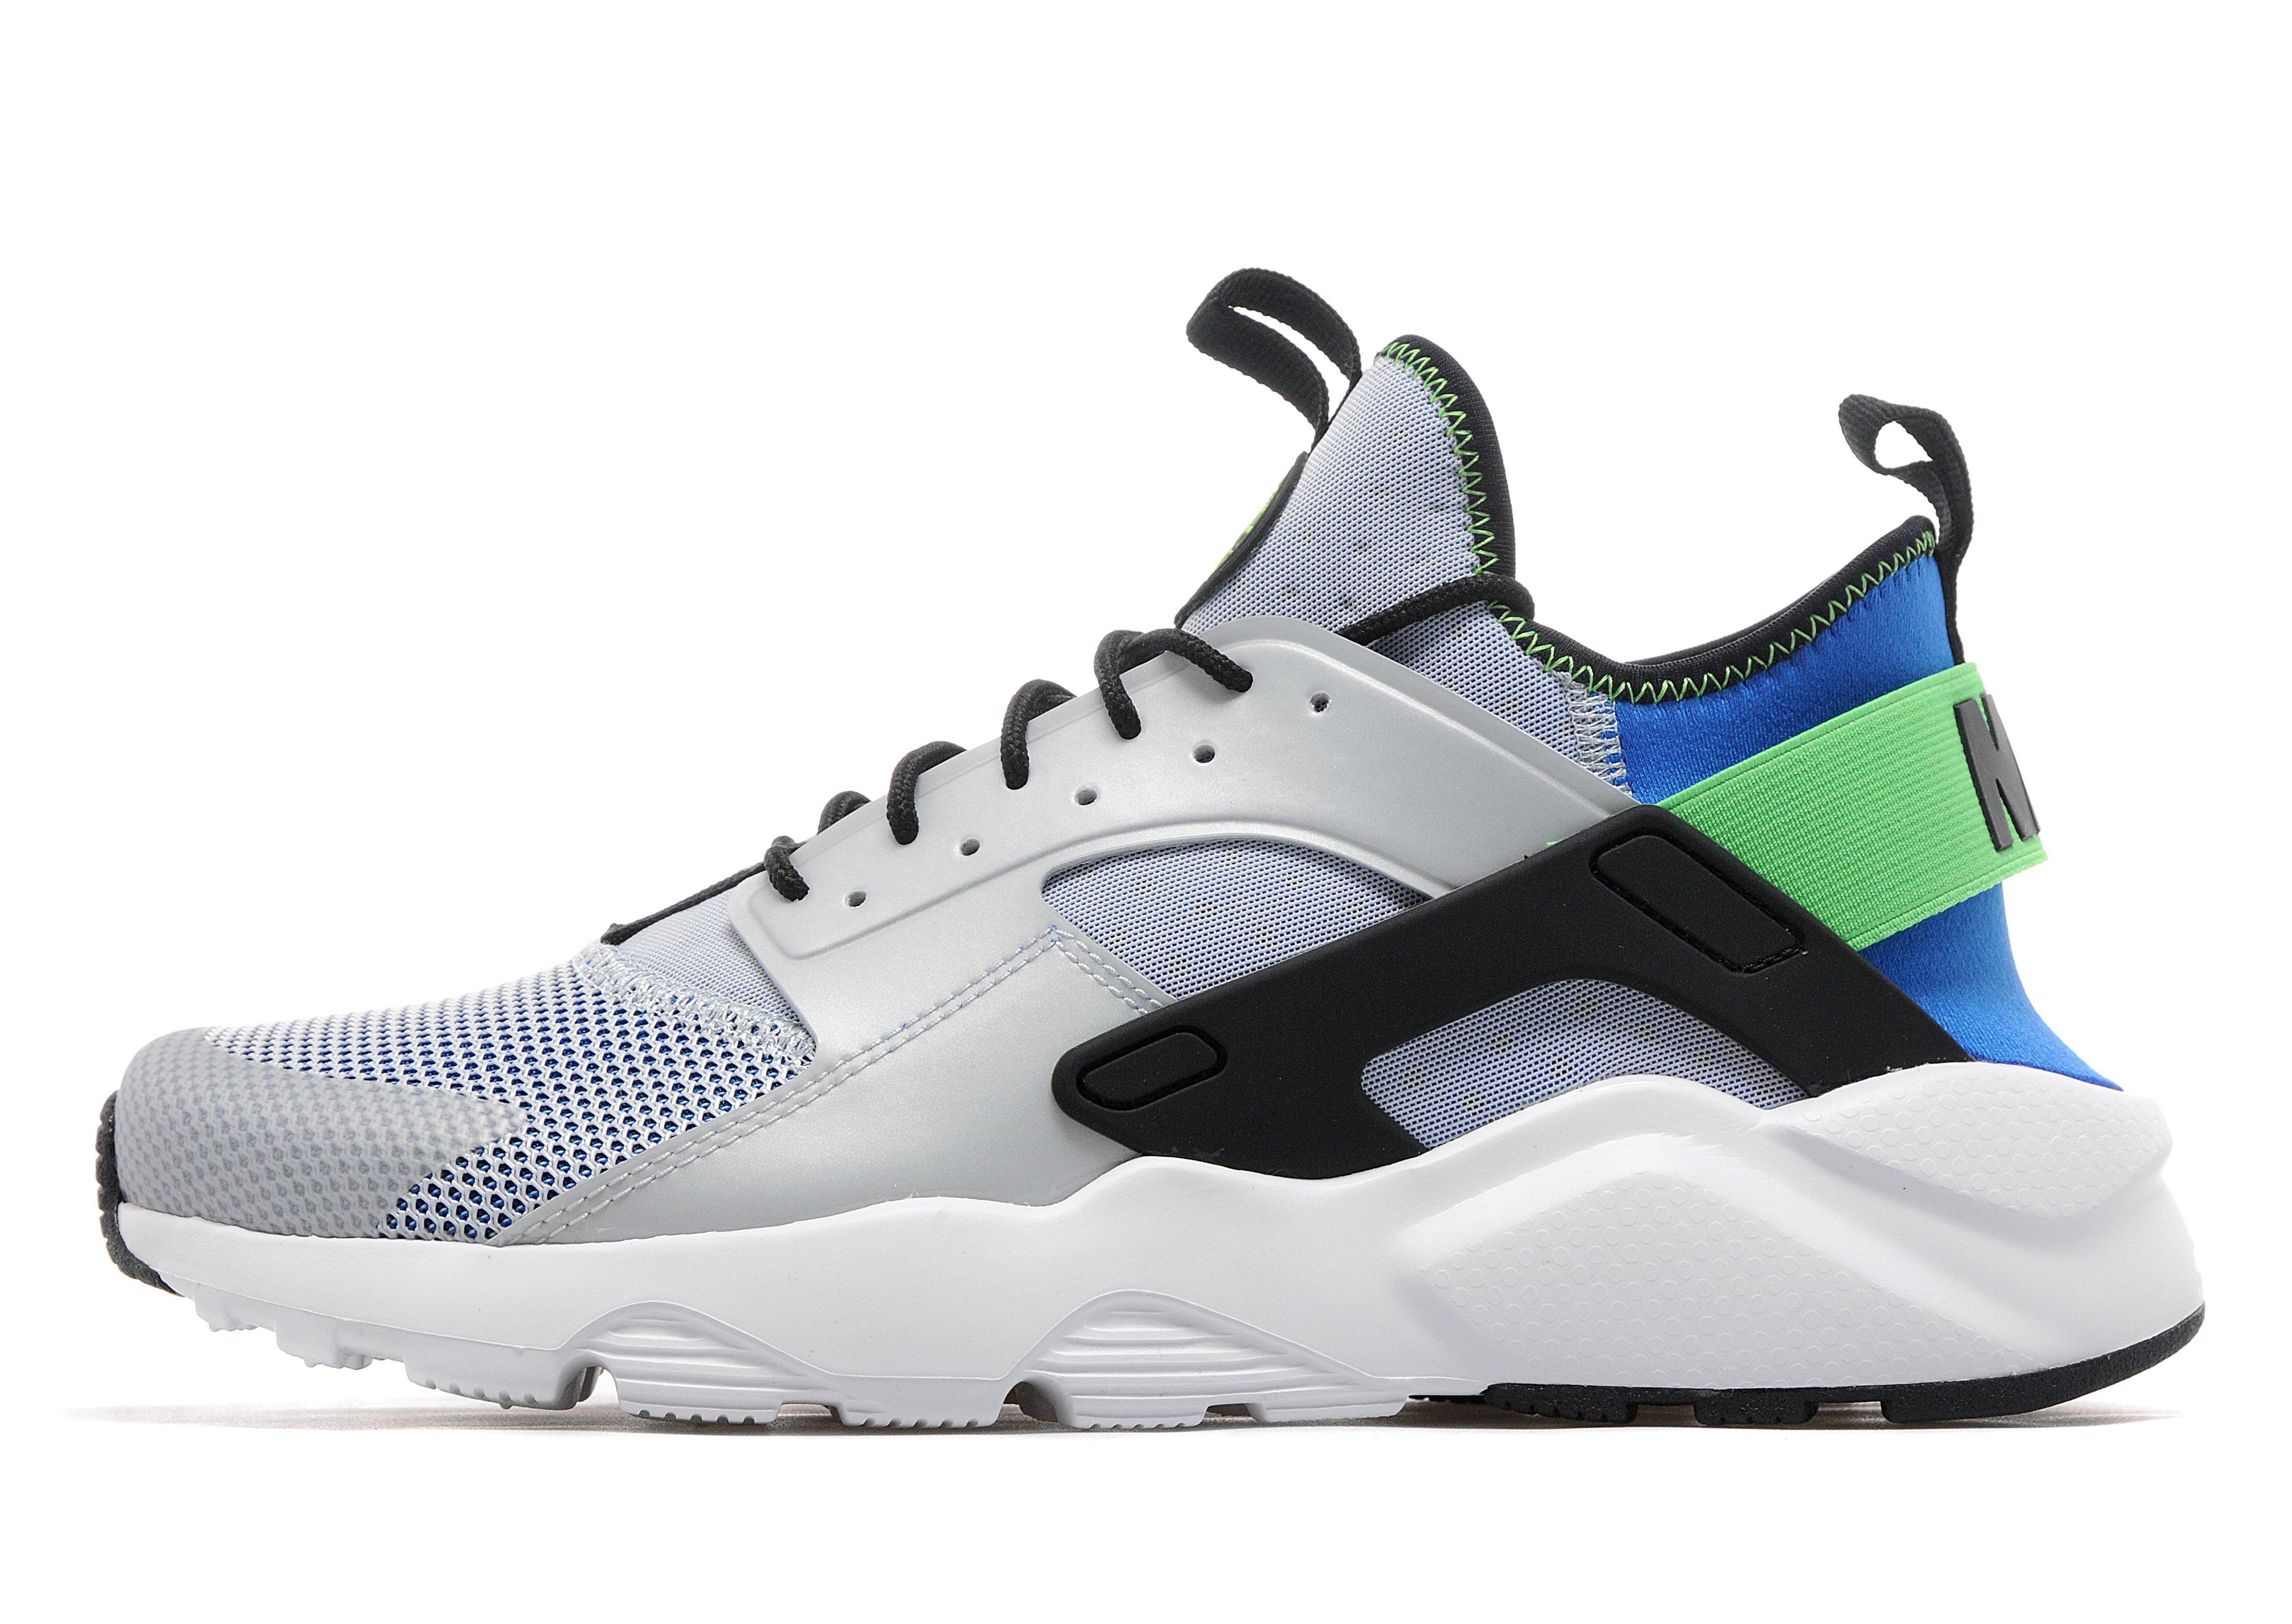 Nouvelles Chaussures Nike Jd Sportsplex